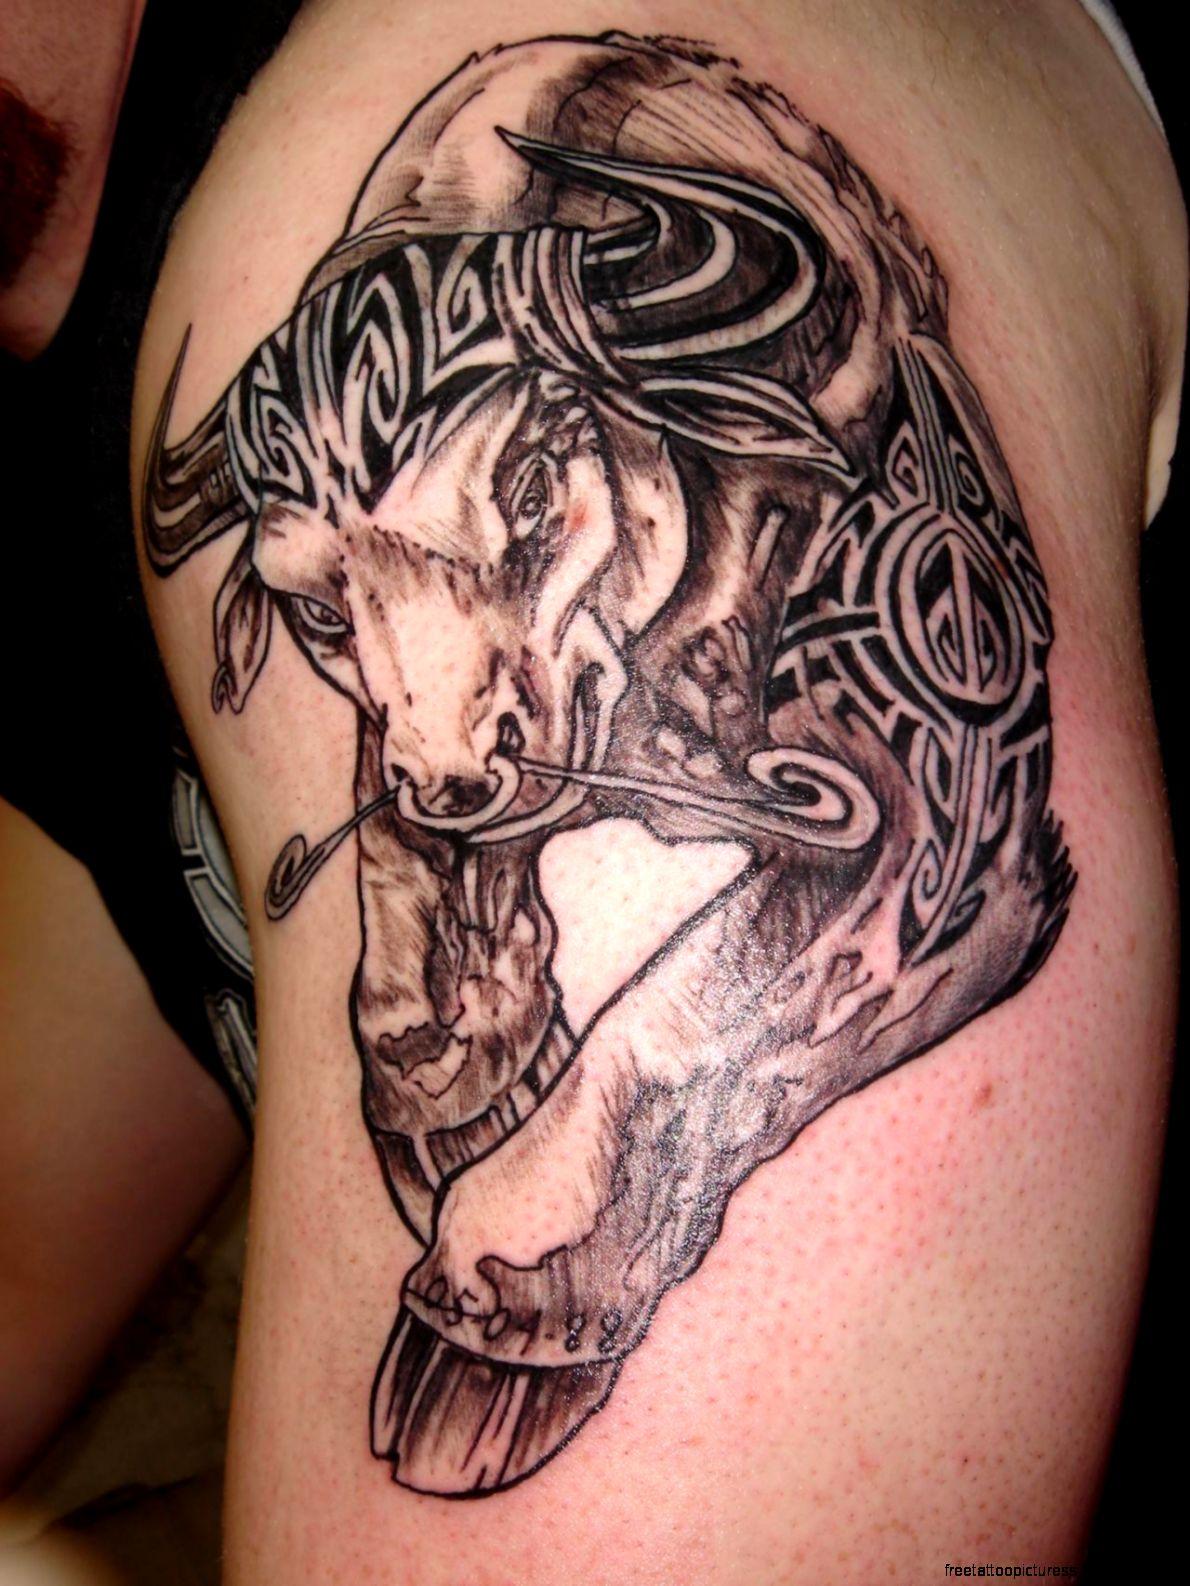 Leavenworth Tattoo amp Piercing Haus   Geisha39s Tattoo Gallery